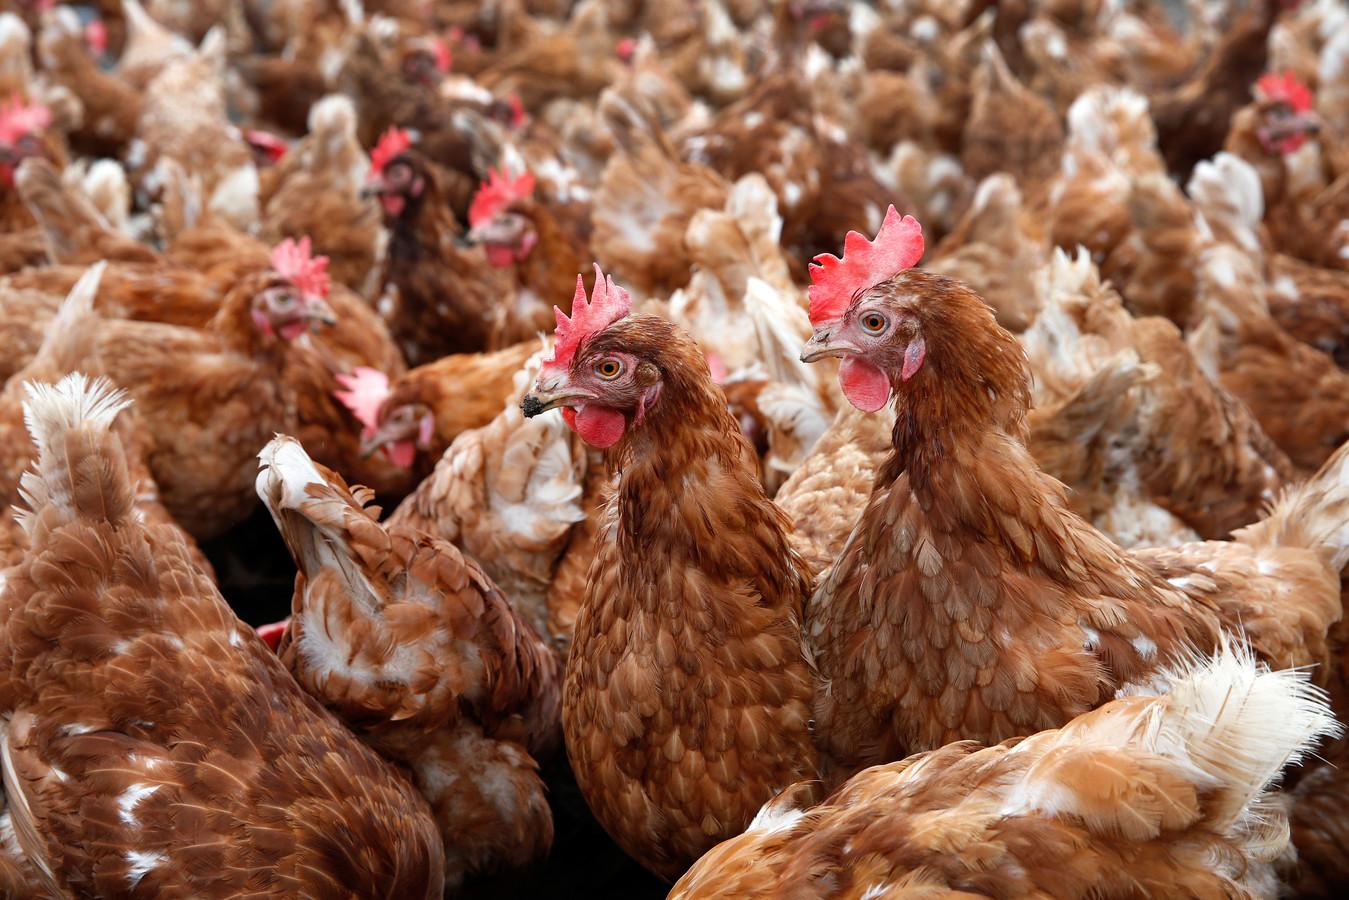 De kippen mogen er komen in Winssen. Foto is ter illustratie.